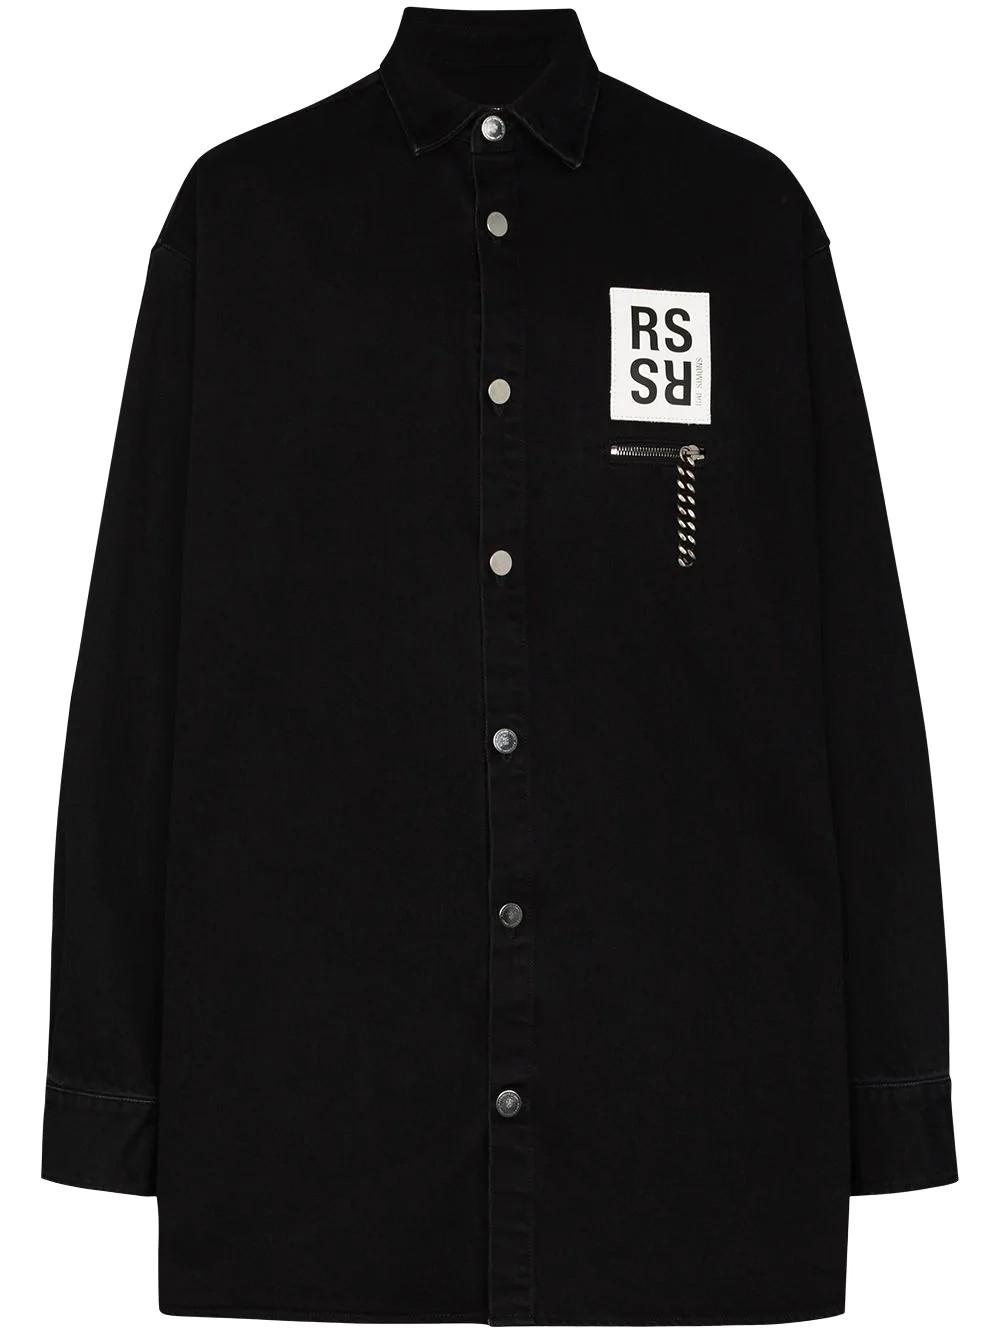 Big f it denim shirt with zipped pocket